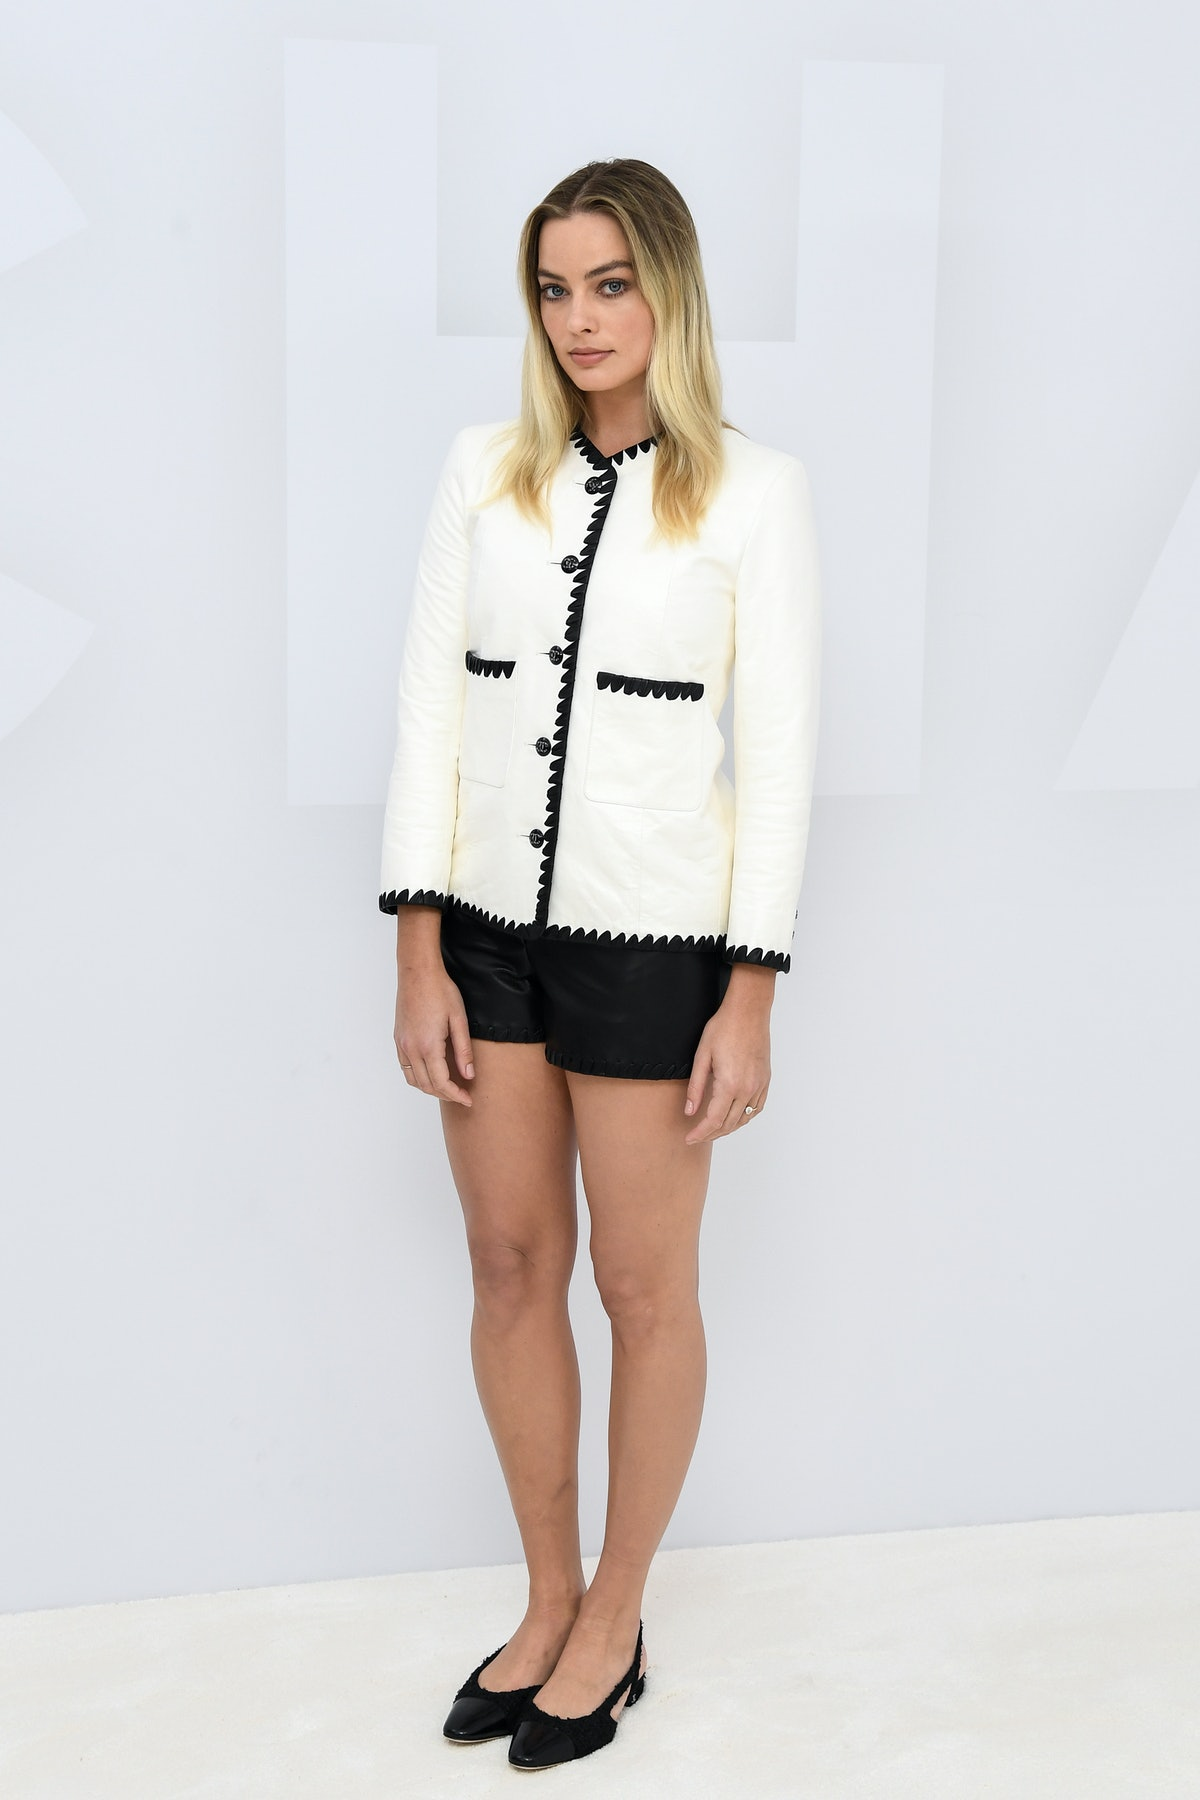 Margot Robbie in Chanel suit.